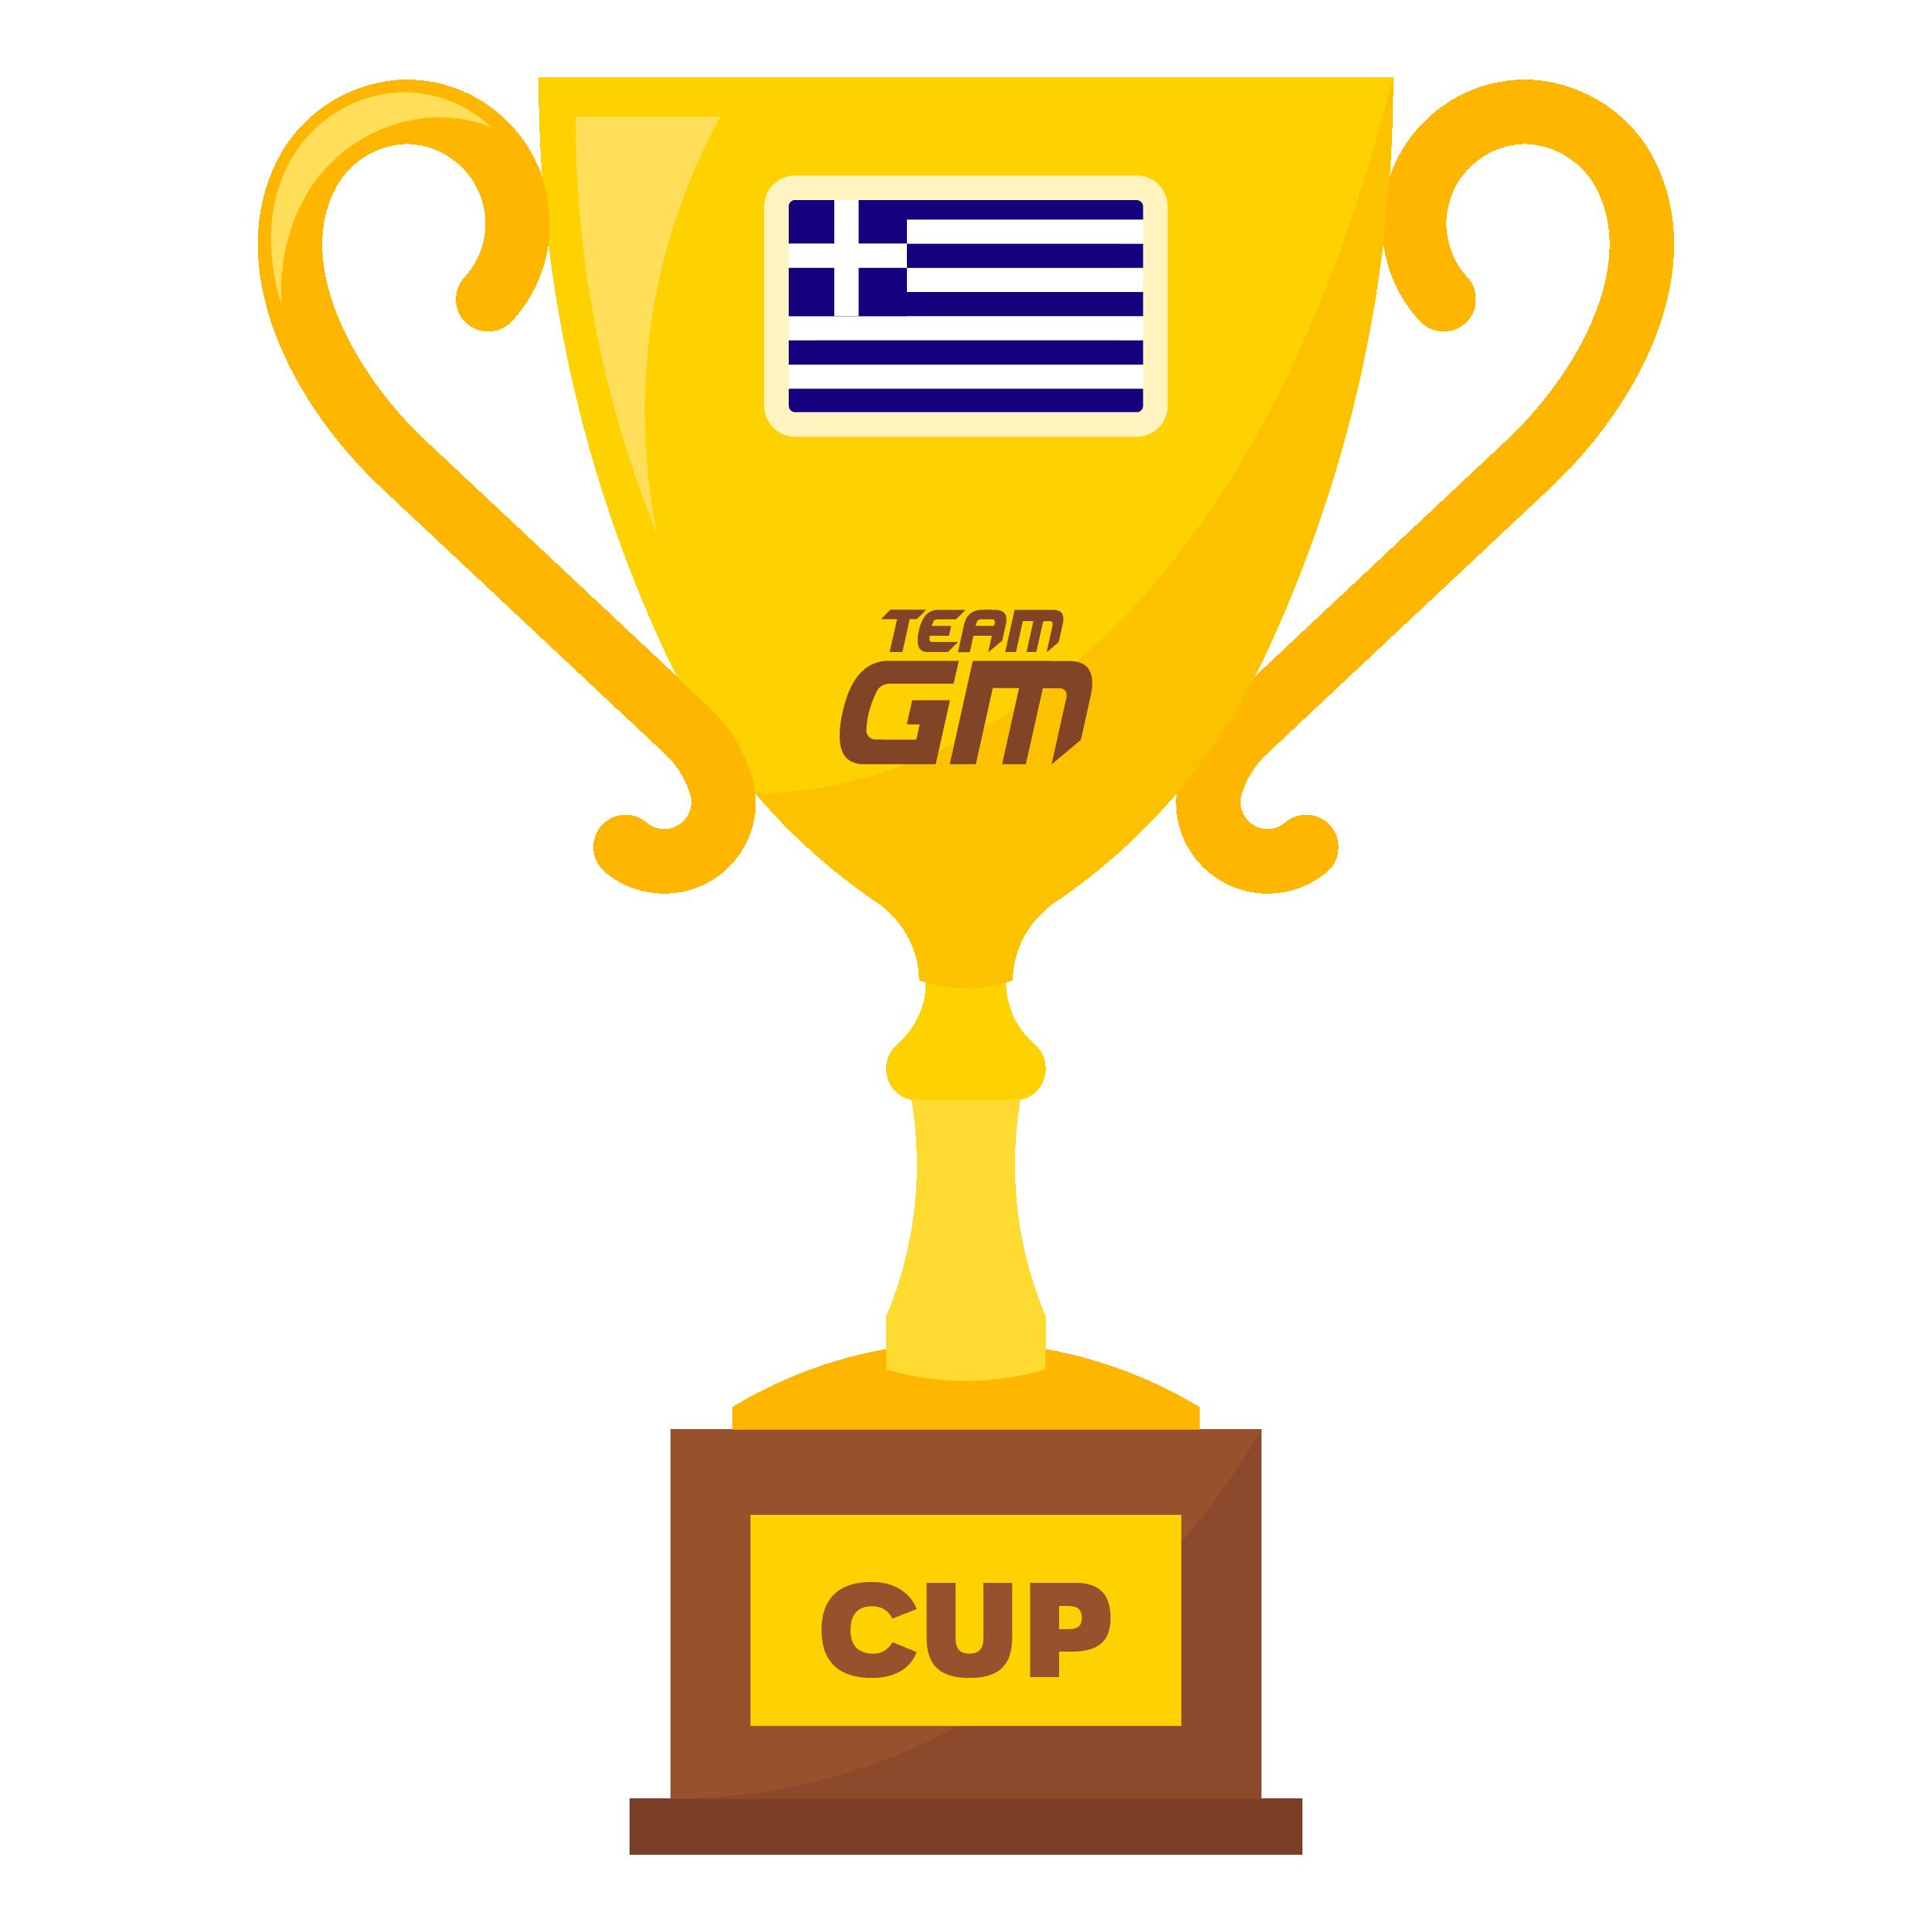 5TH - GREEK CUP